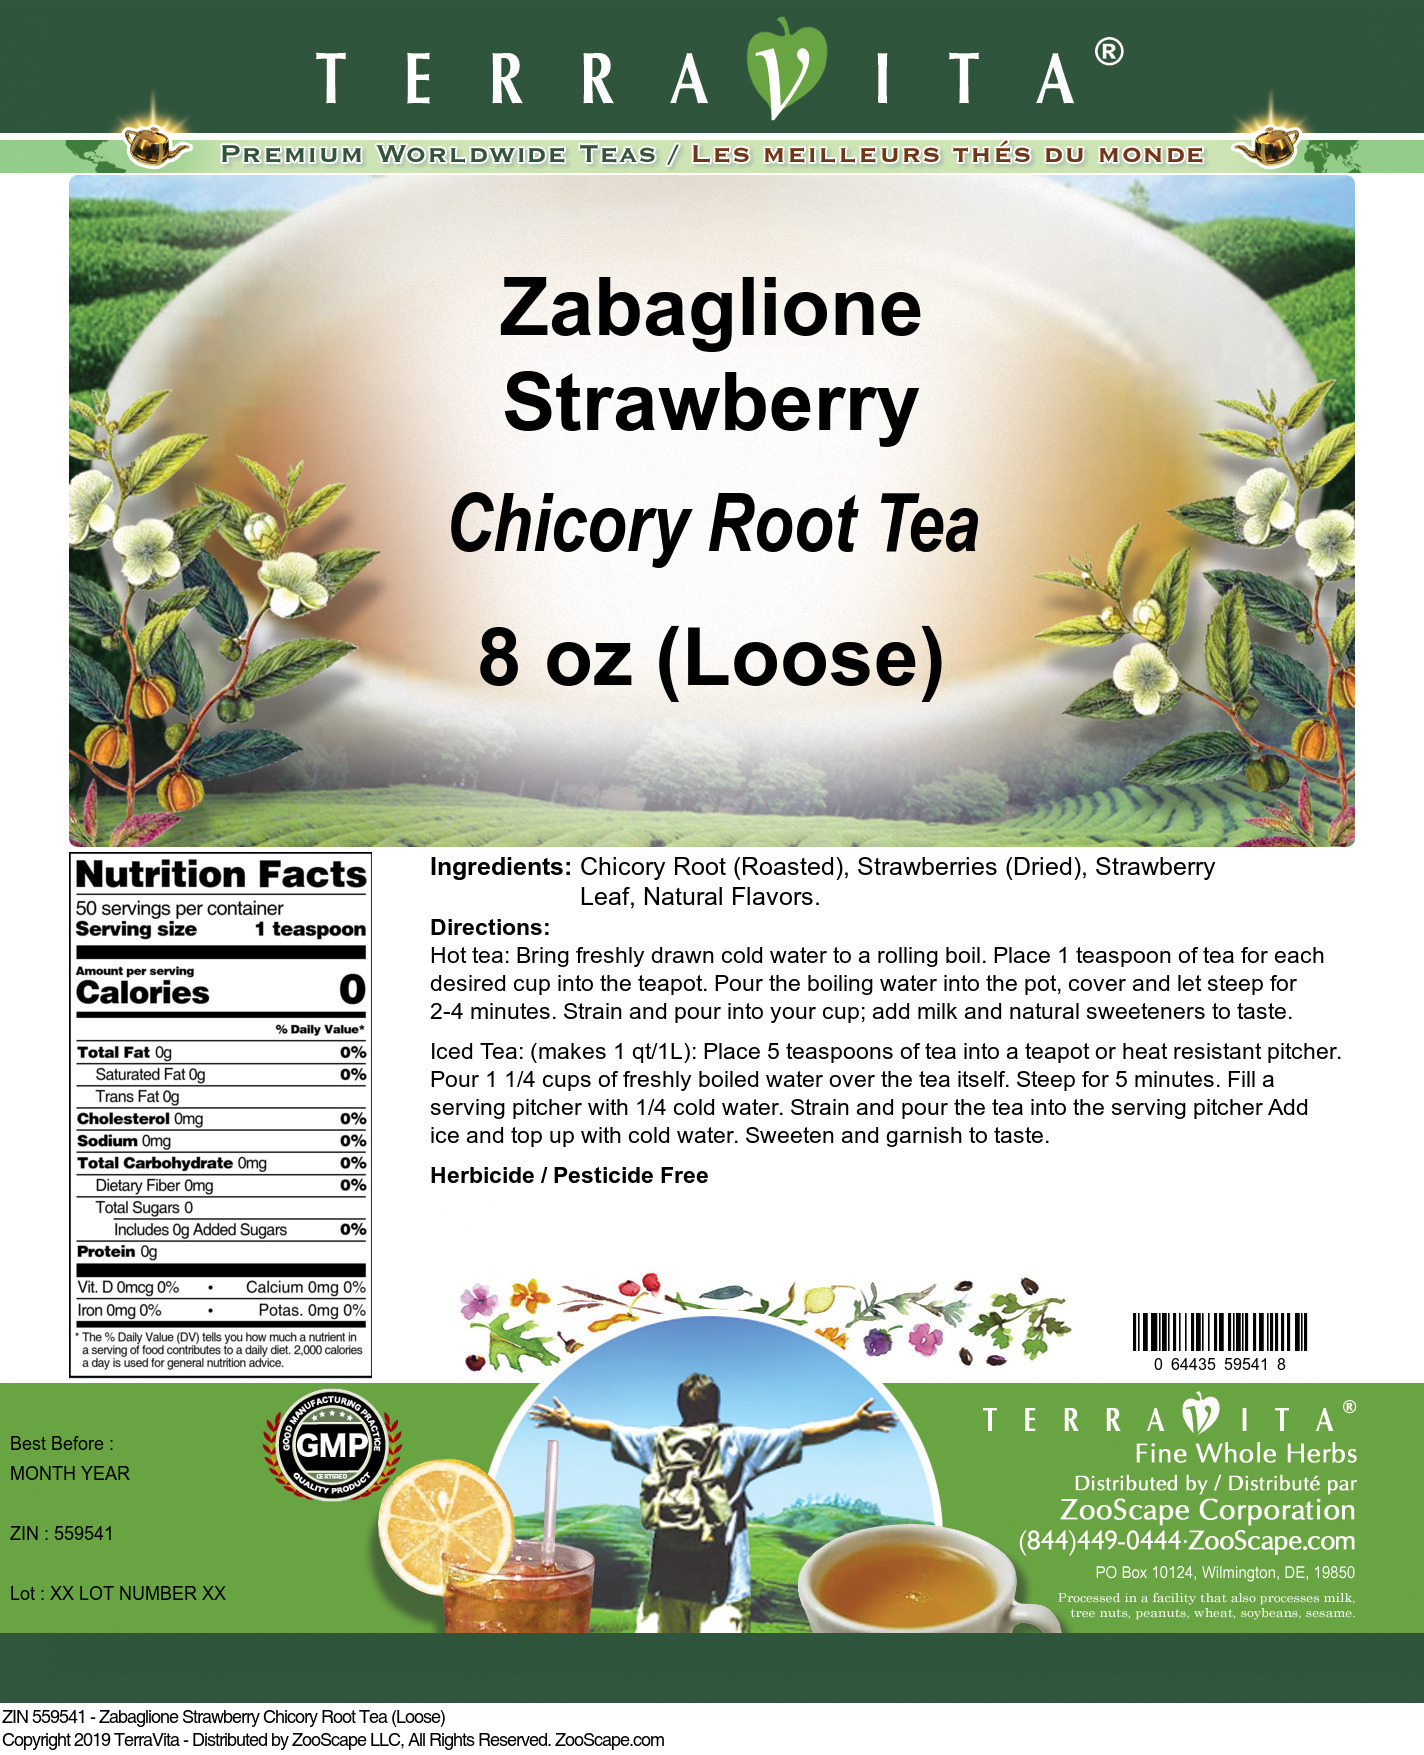 Zabaglione Strawberry Chicory Root